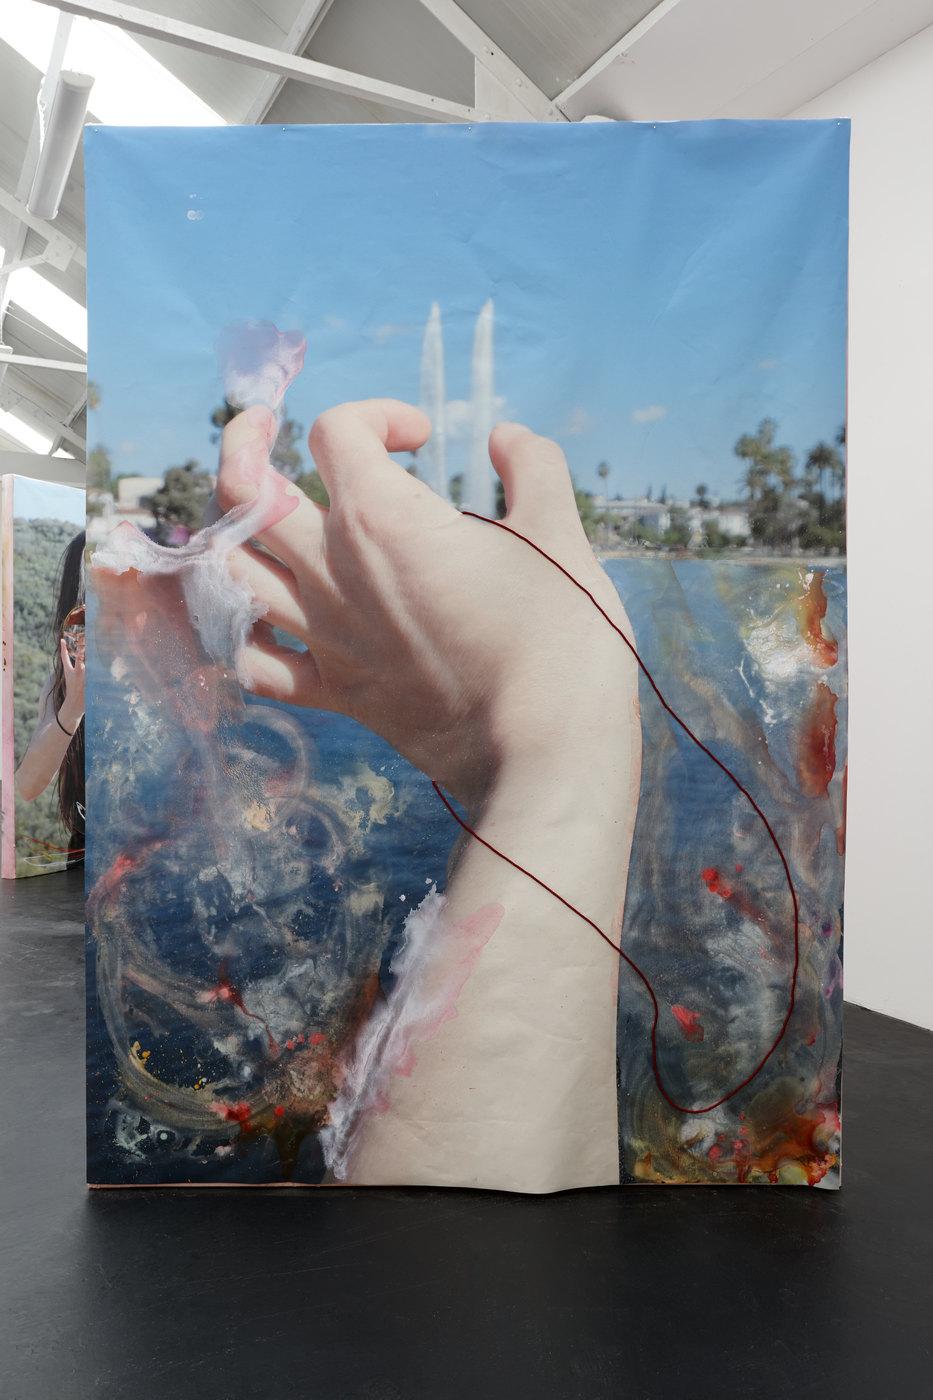 03. Nora Berman - Rising Stick (Echo Park pinch), 2016 (ii)